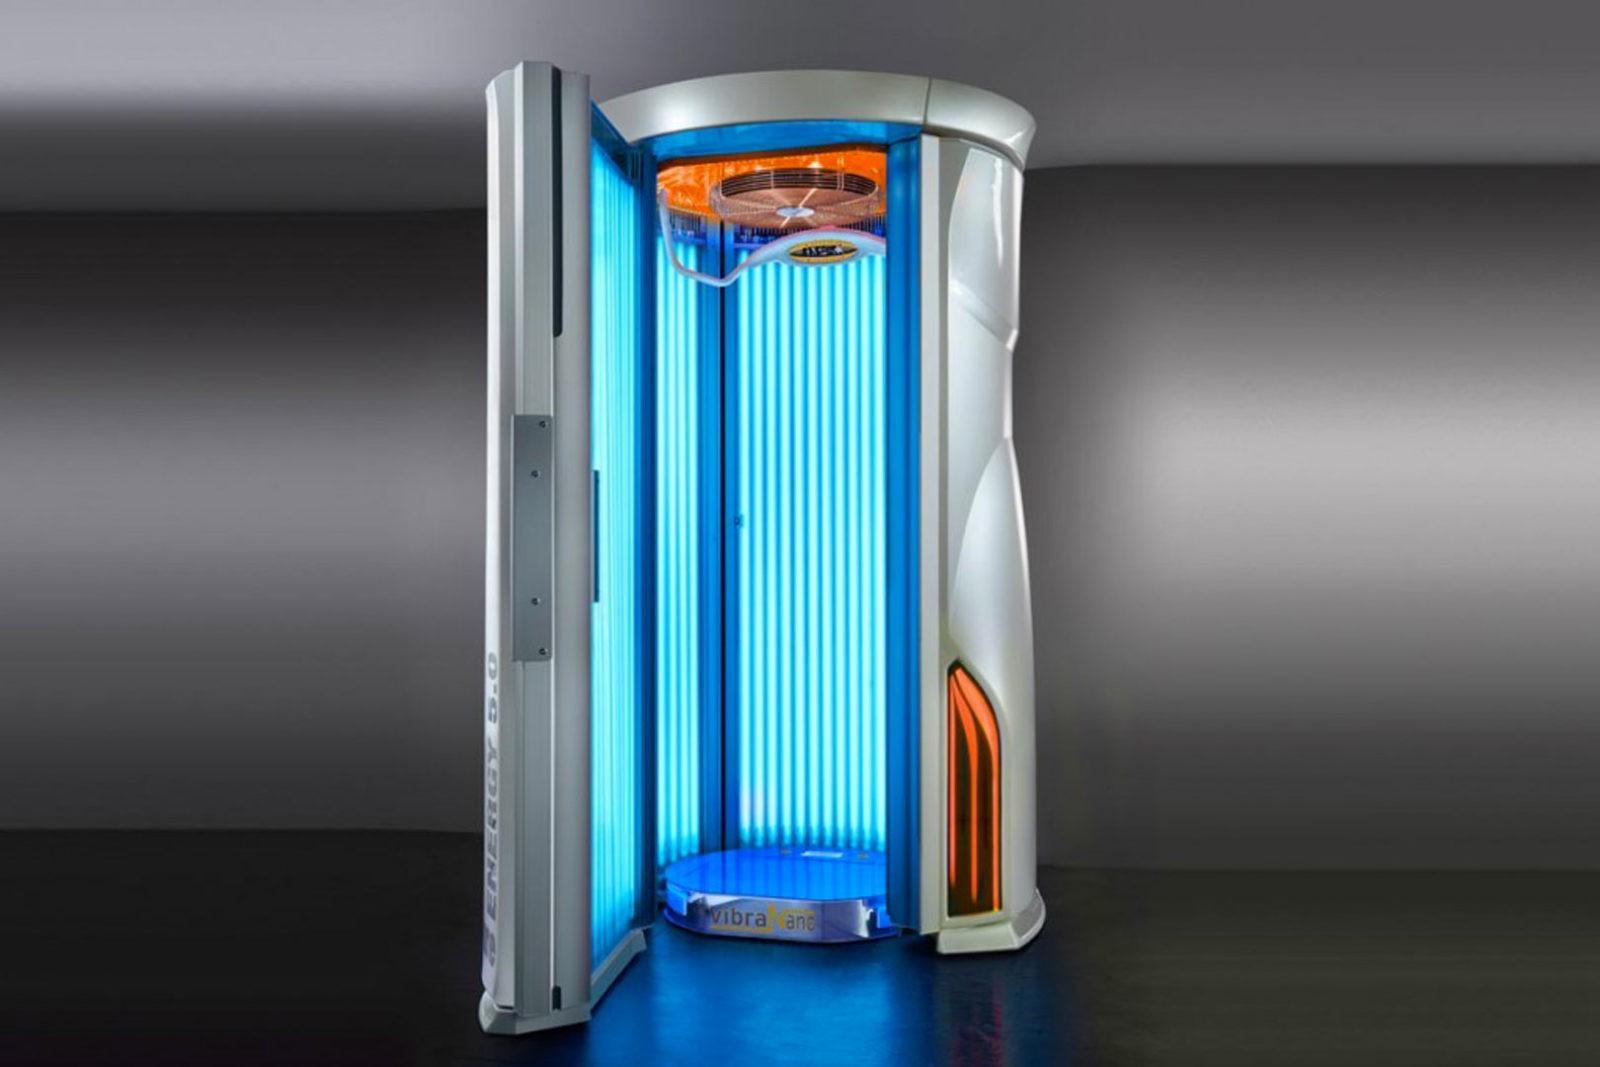 Doccia solare megasun power energy bologna la suite